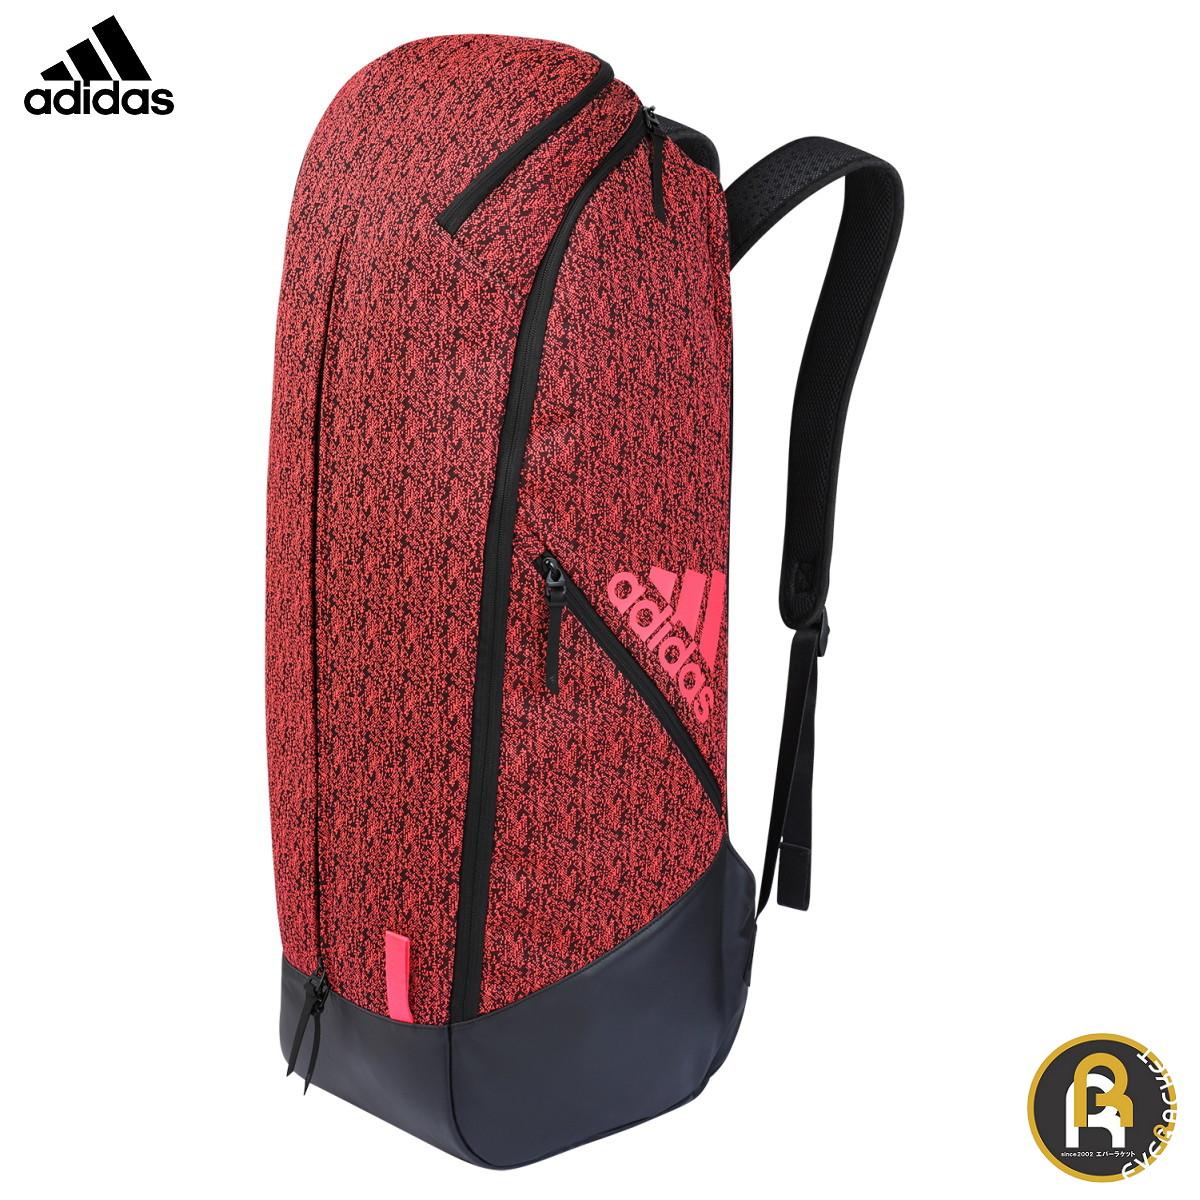 adidas アディダス バドミントン バッグ B7 ラケットスタンドバッグ 9本入り BG910411